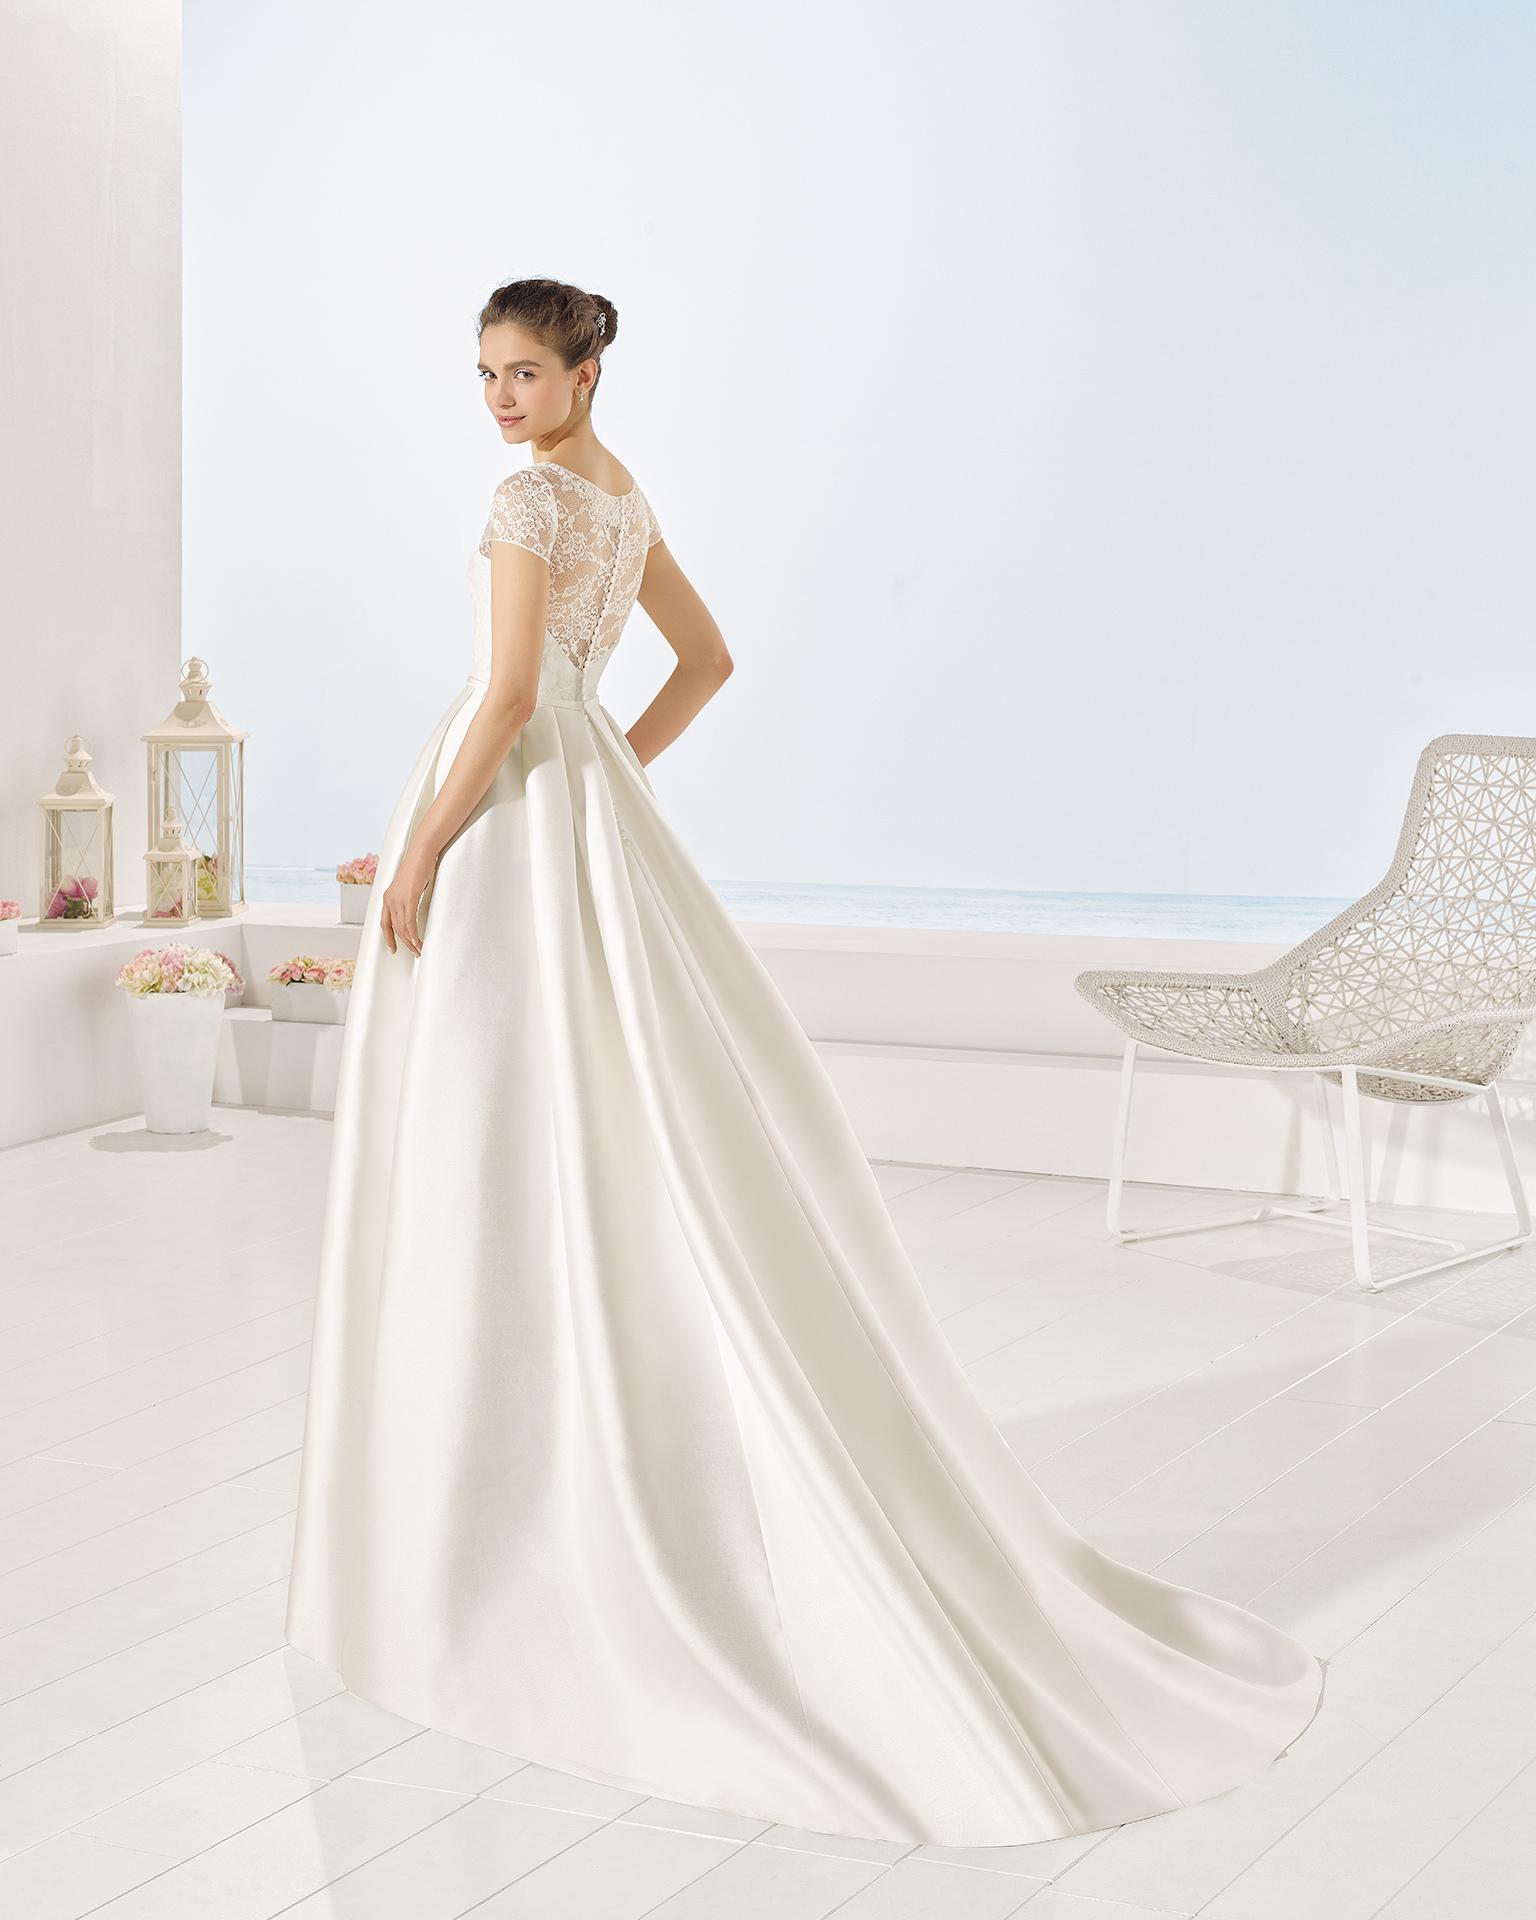 Yurta wedding dress, Luna Novias 2017